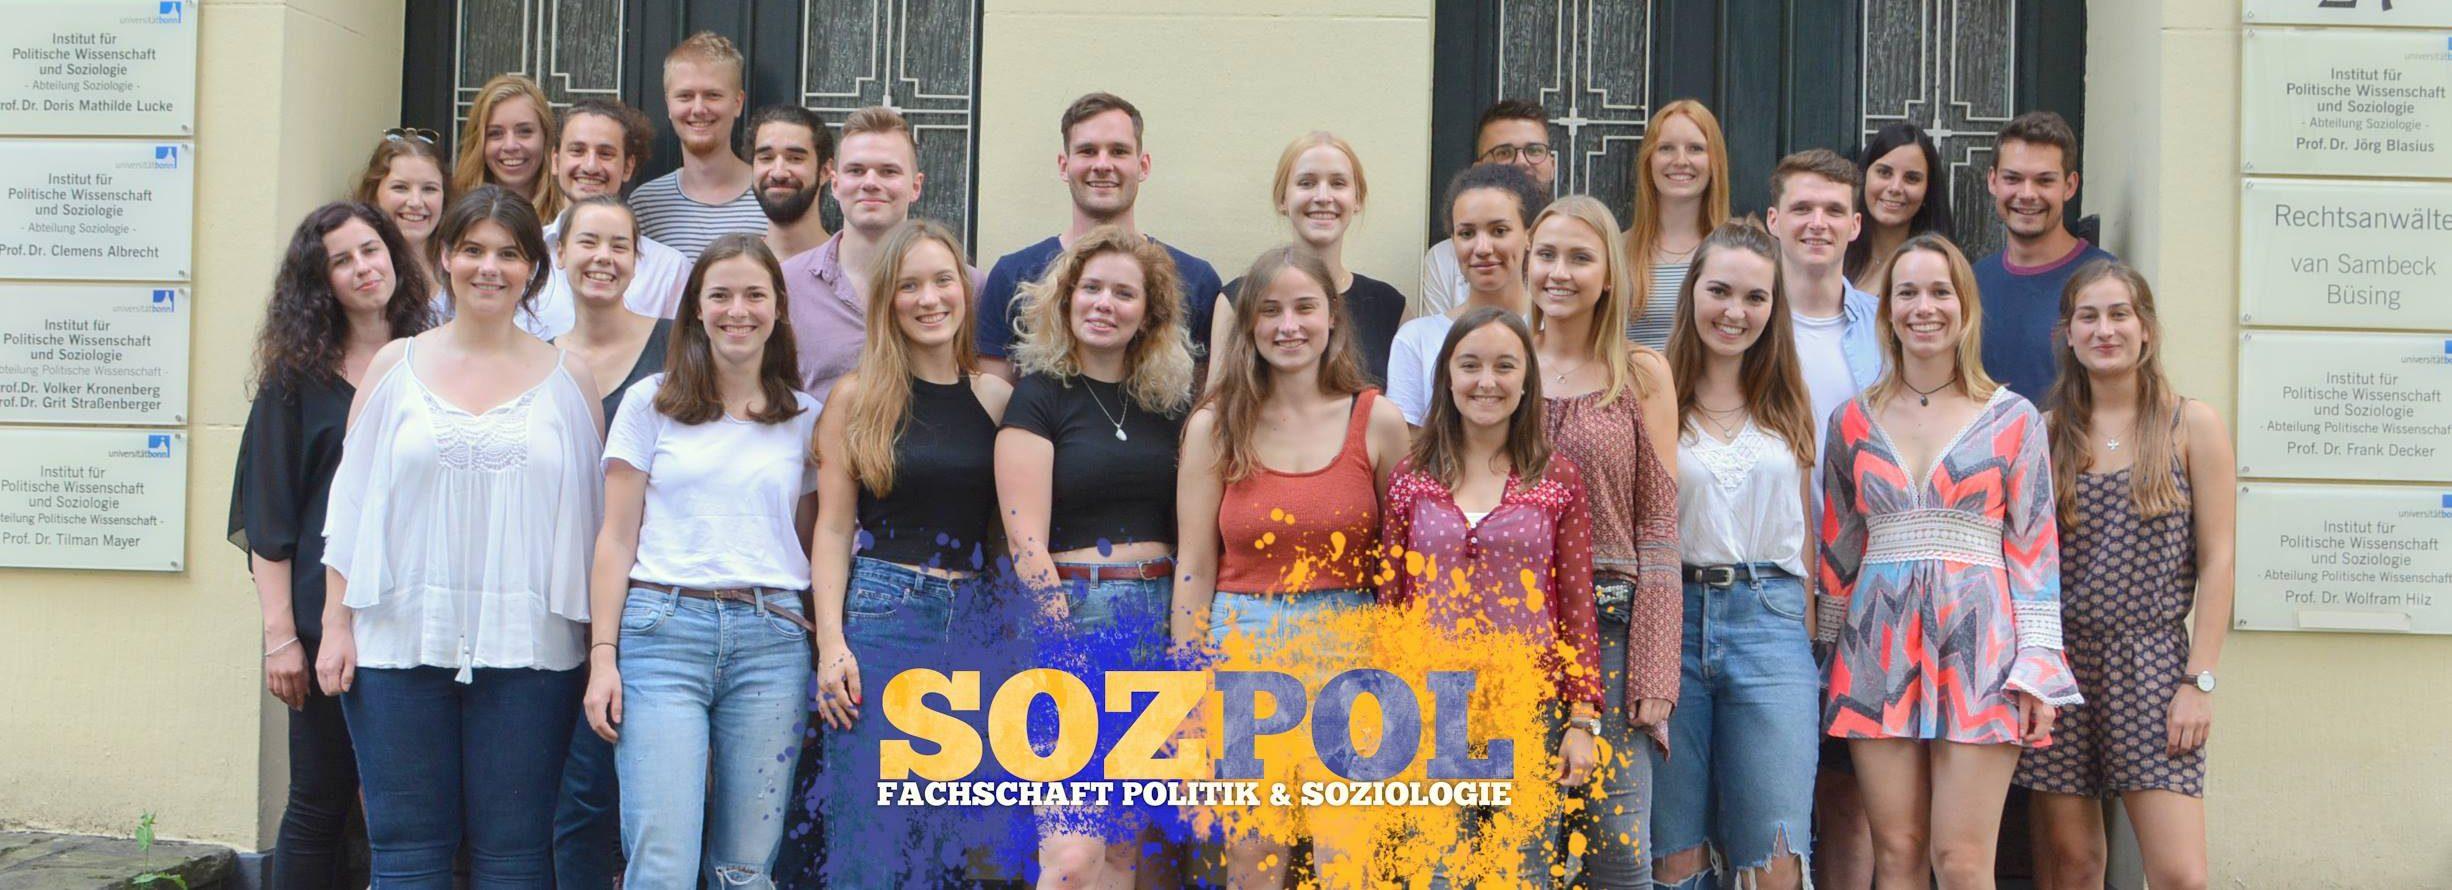 Fachschaft SozPol